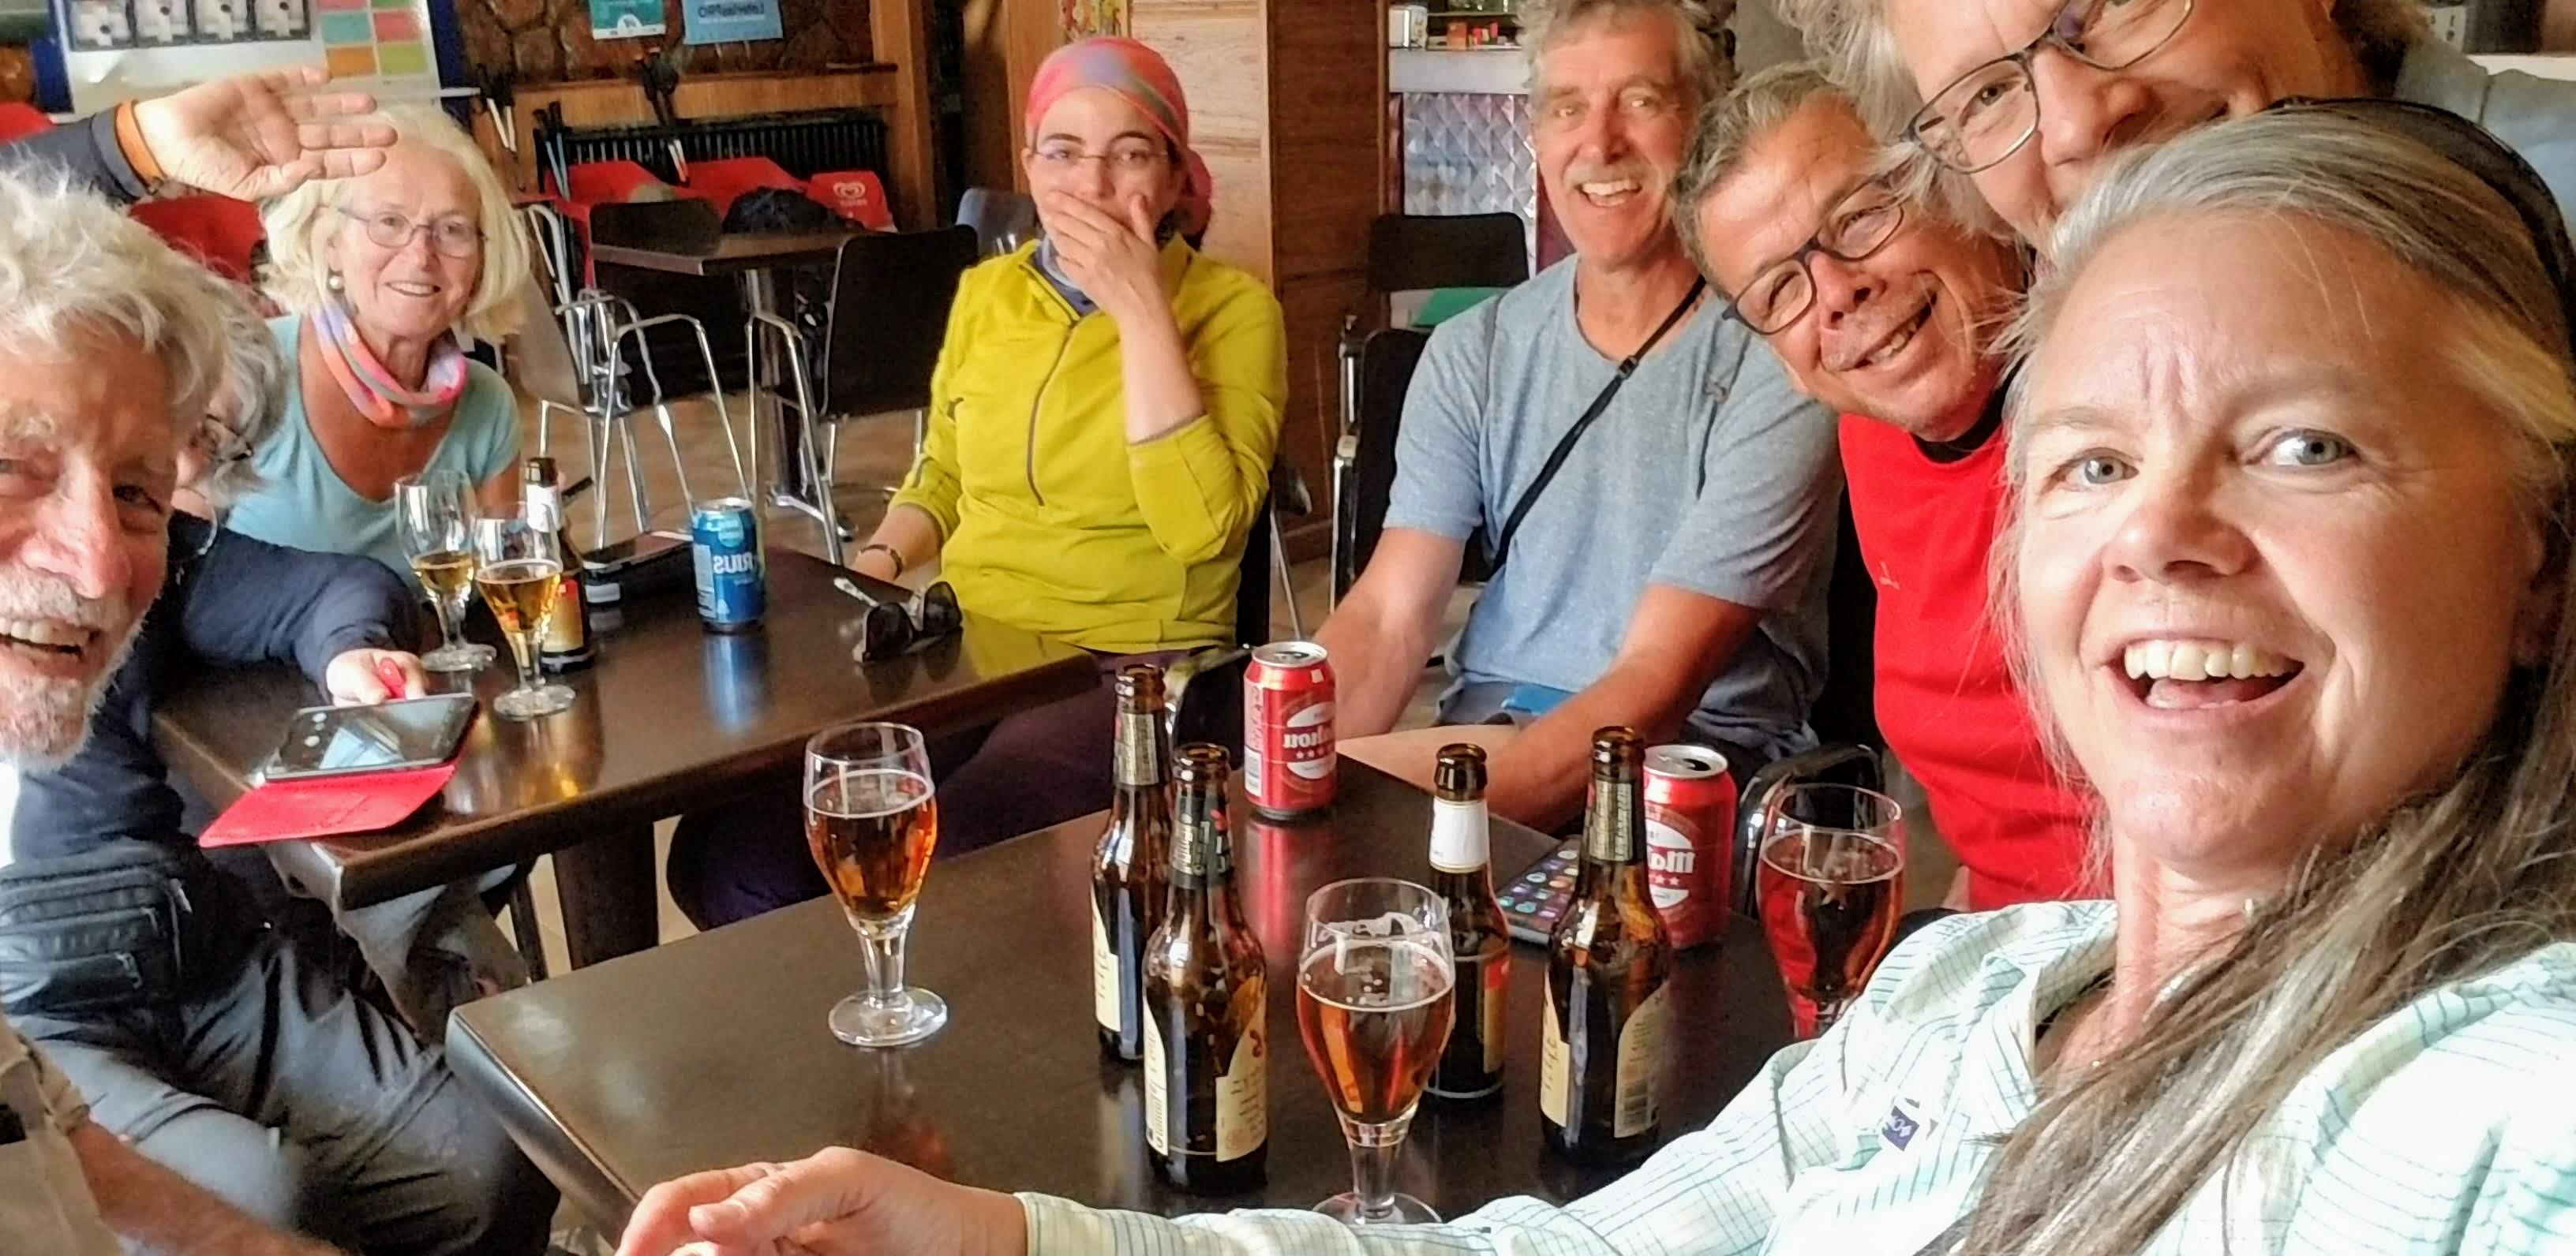 Goofy Selfie at the Bar Stop in Santa Marta de Tera